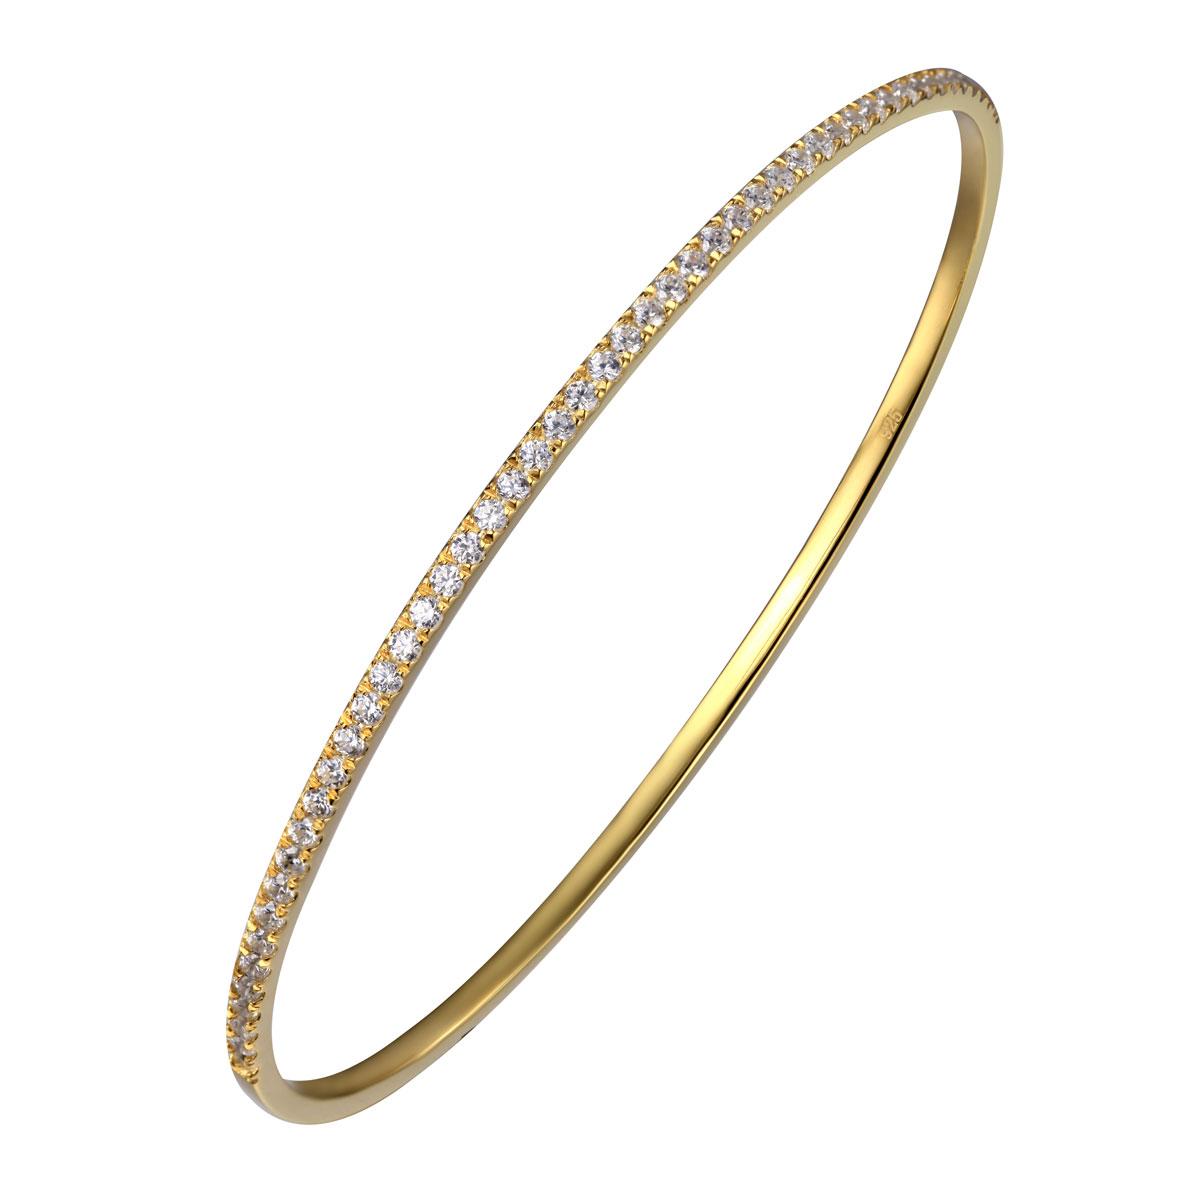 Cashs Ireland, Bond 18k Gold and Crystal Bangle Bracelet